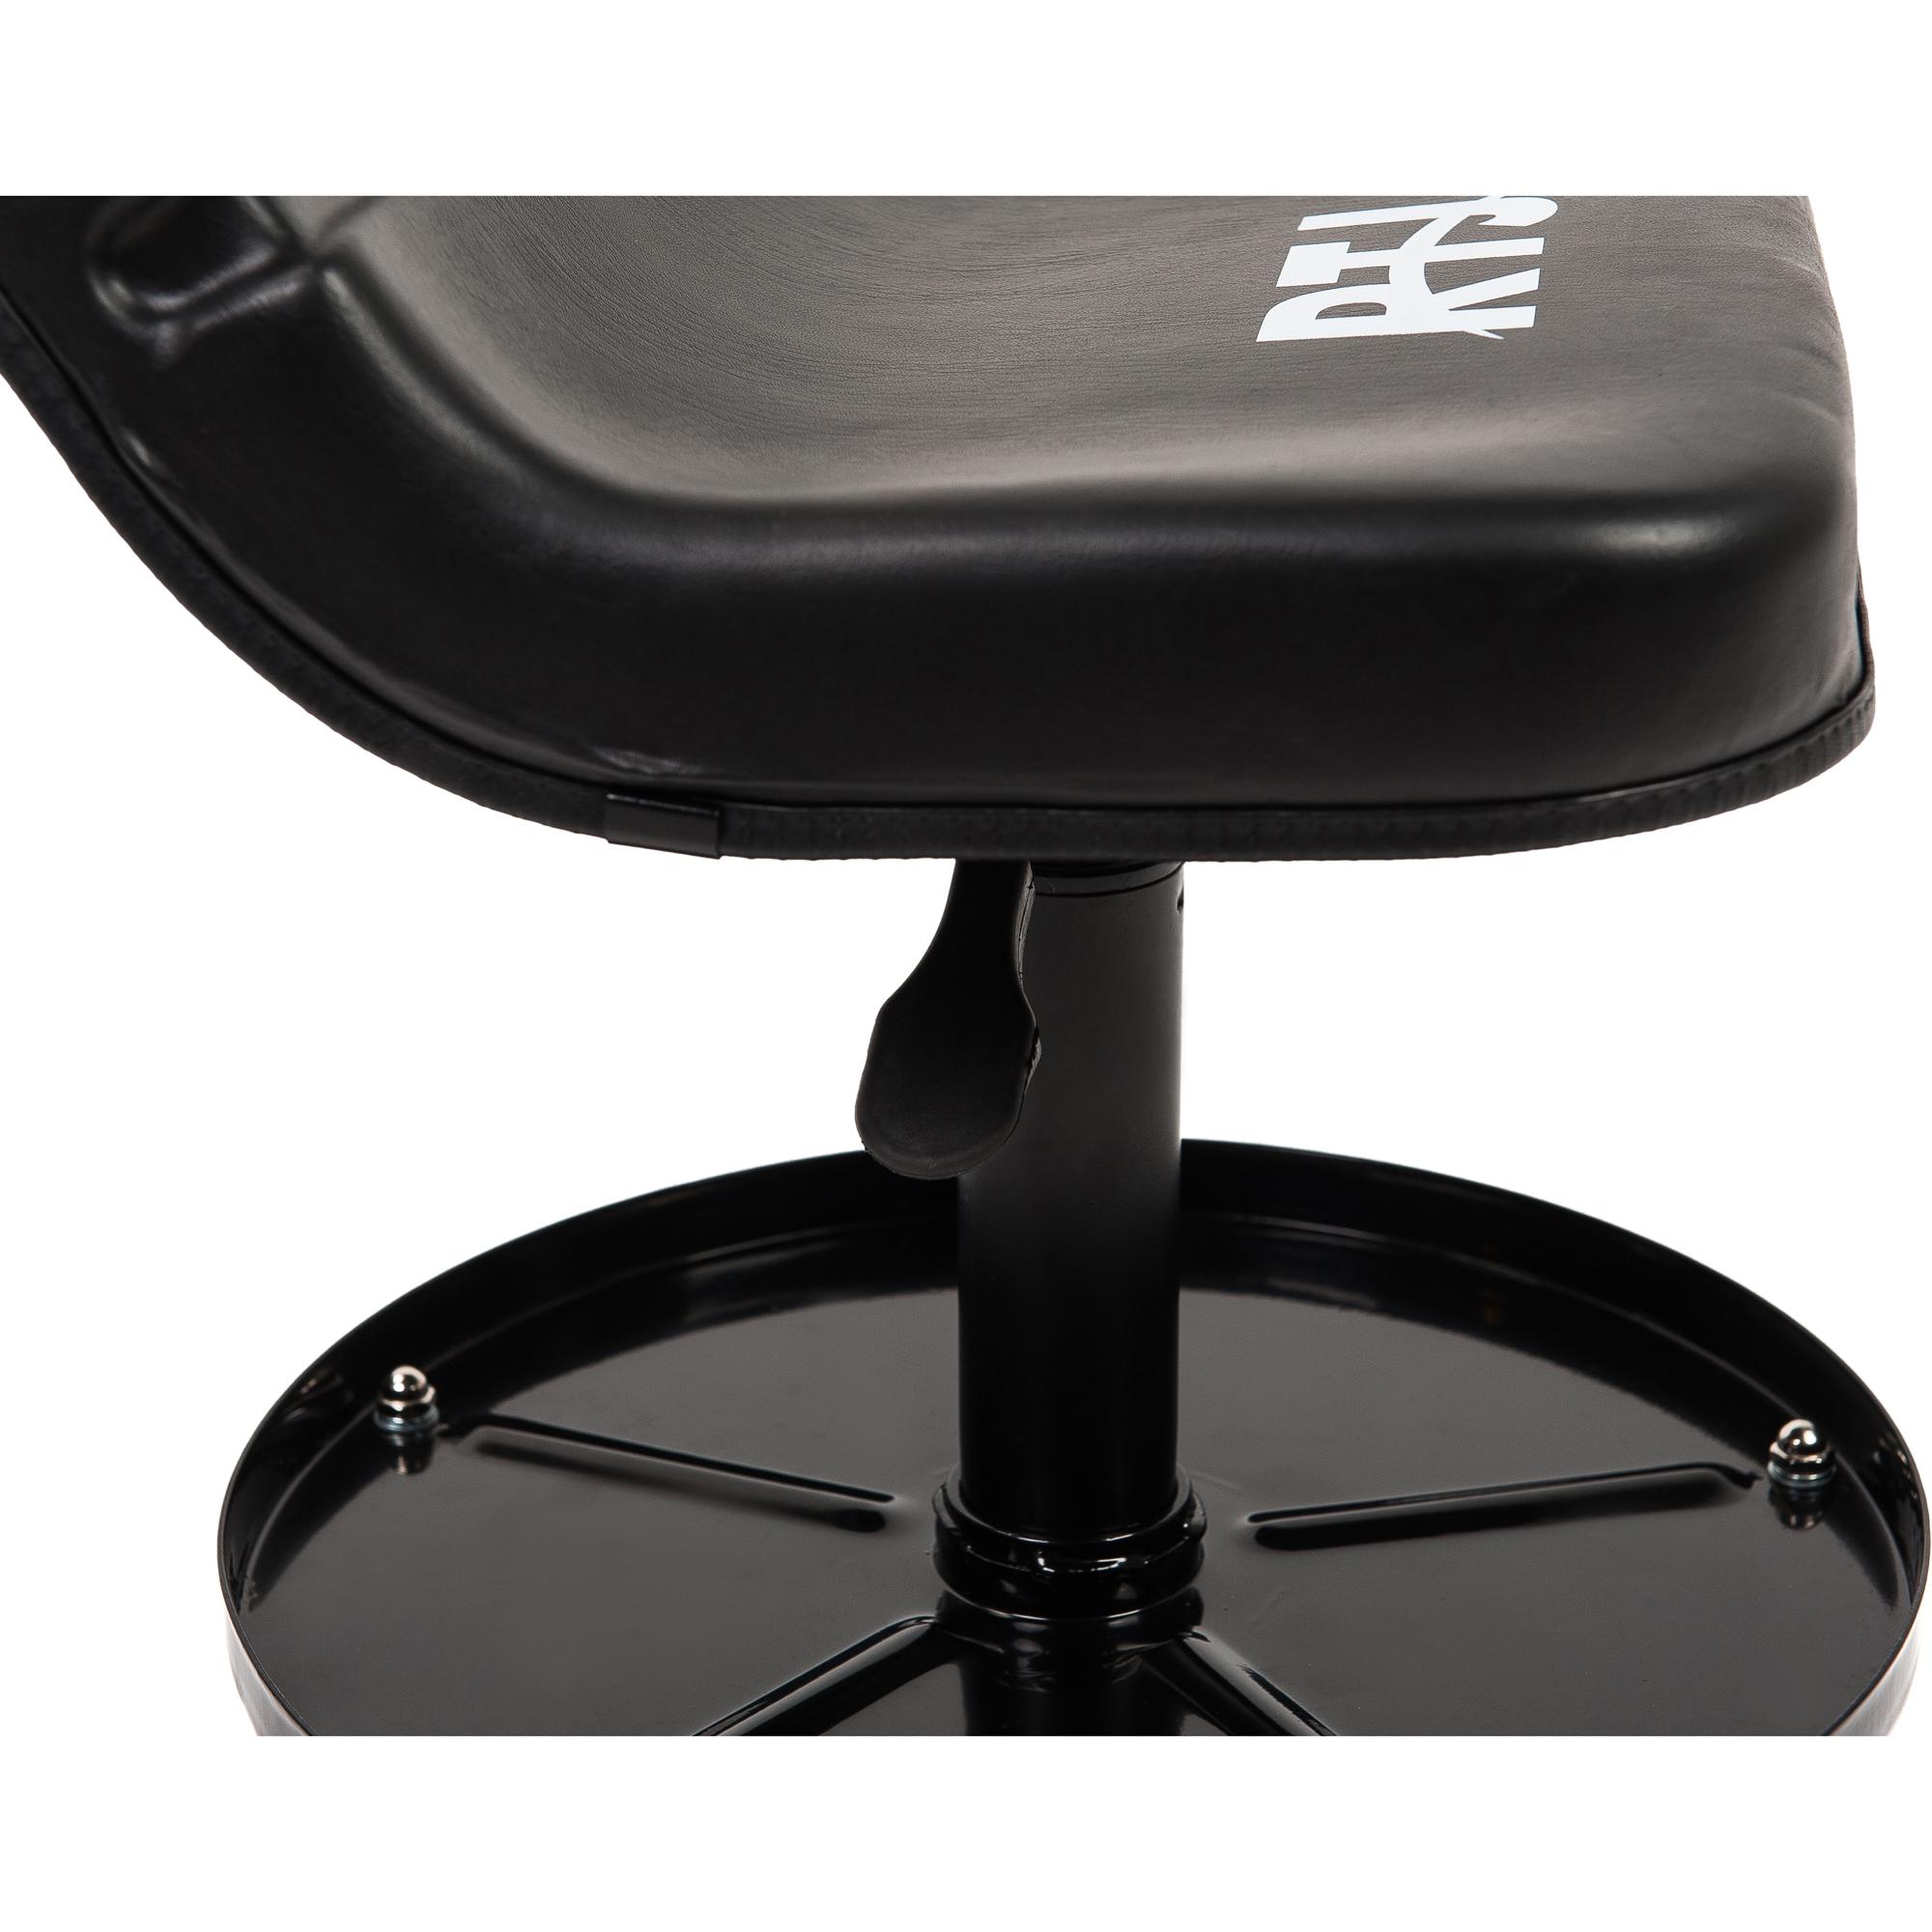 Fabulous Rtj 300 Lbs Capacity Pneumatic Mechanic Roller Seat Ibusinesslaw Wood Chair Design Ideas Ibusinesslaworg